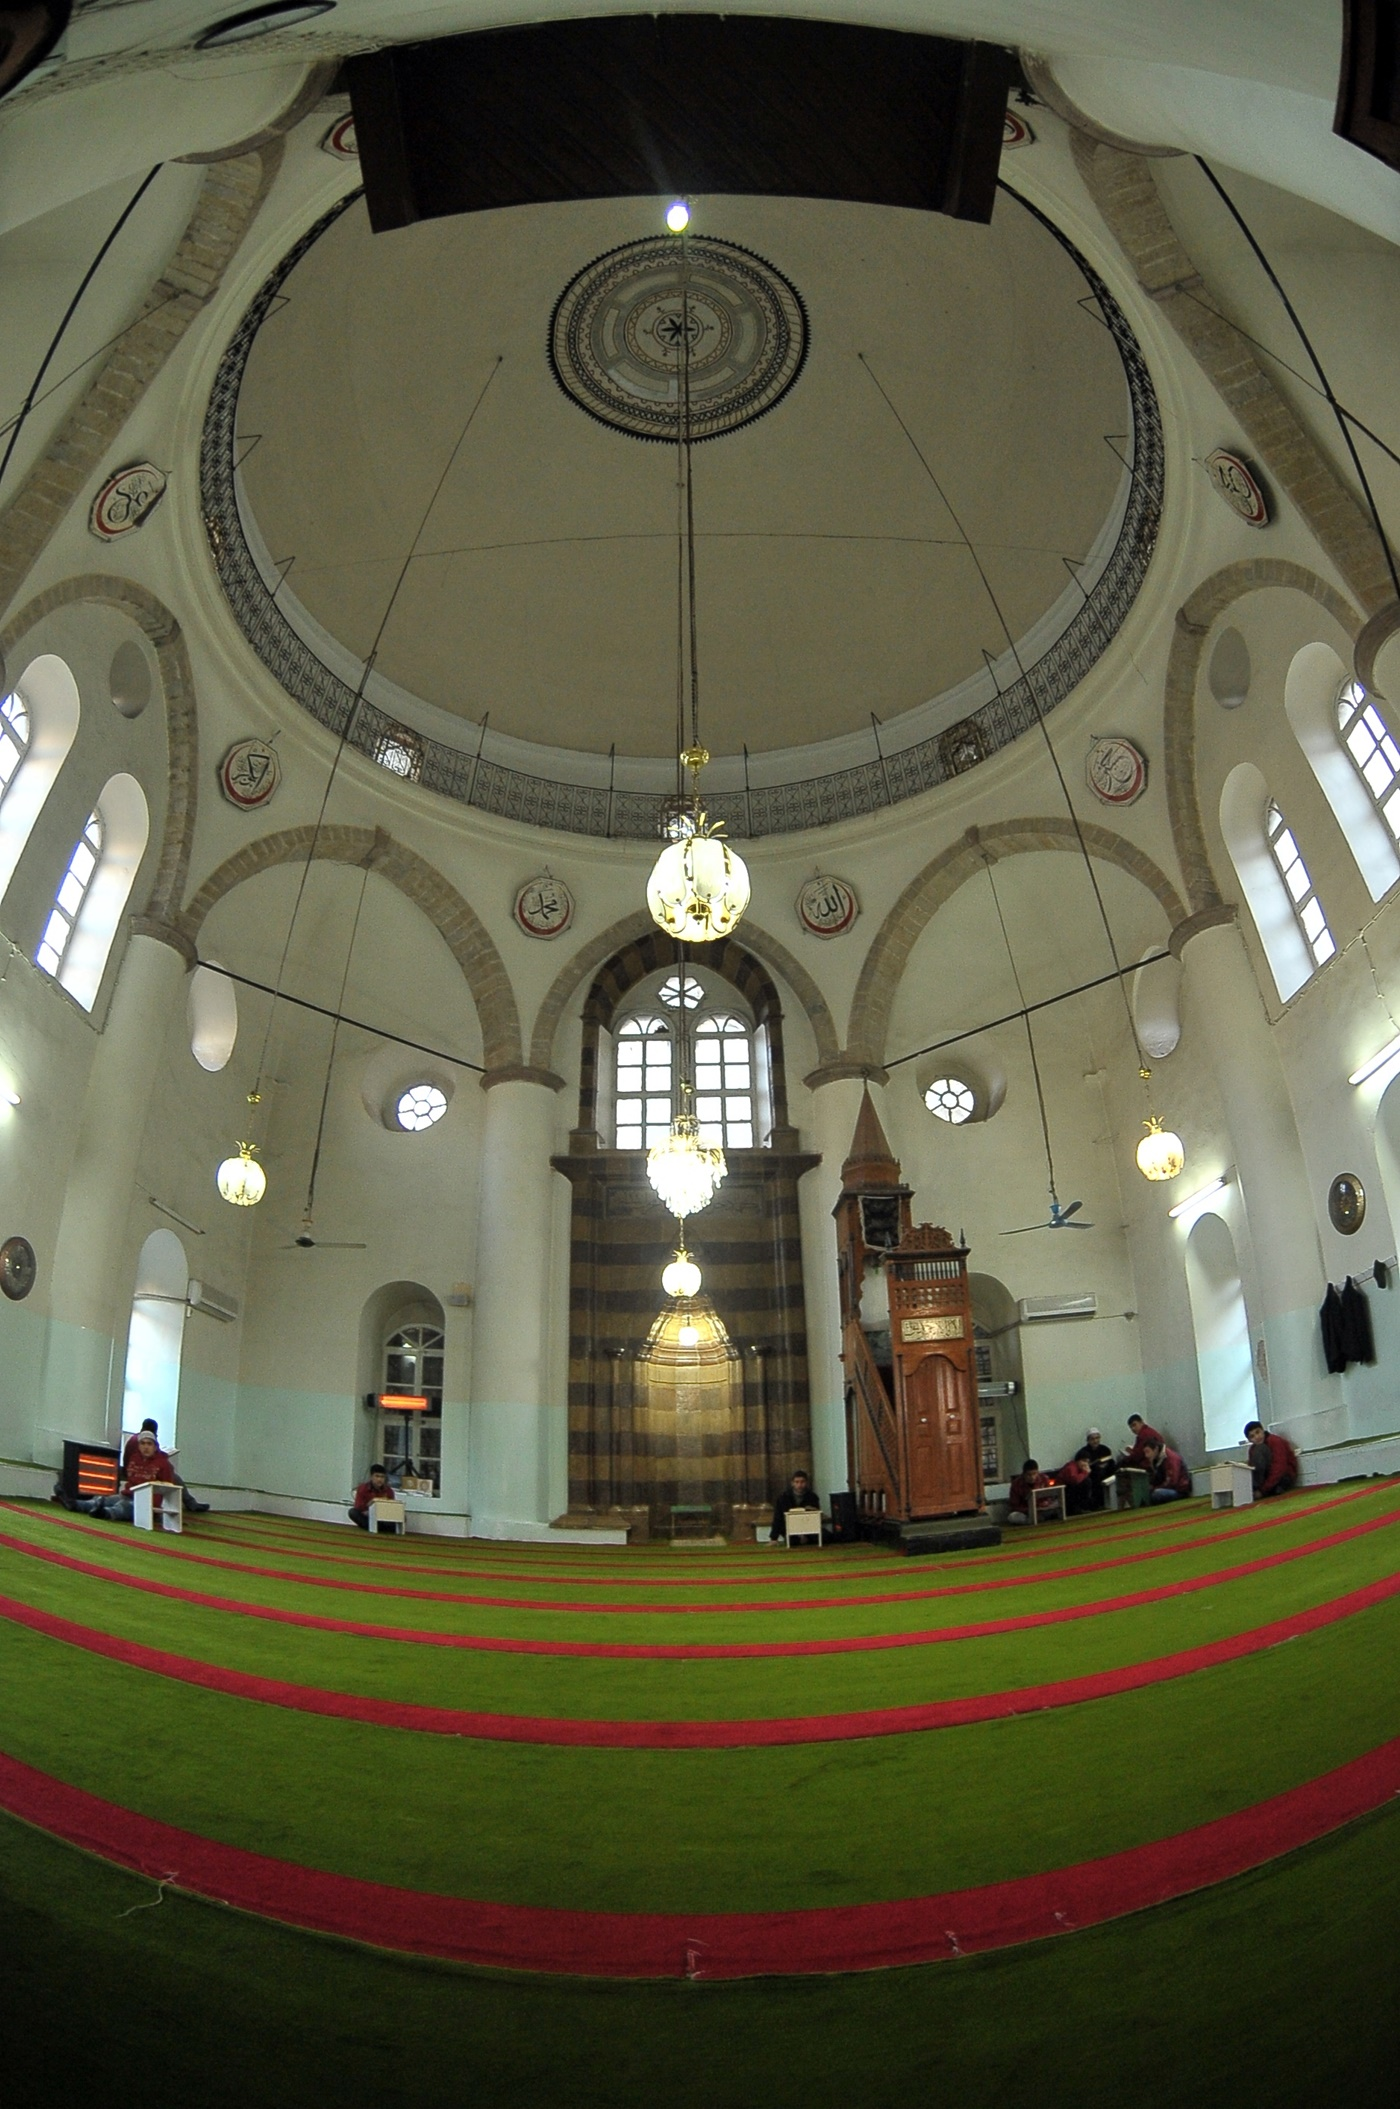 Skender bey acemli mosque kahramanmara city guide an error occurred thecheapjerseys Gallery